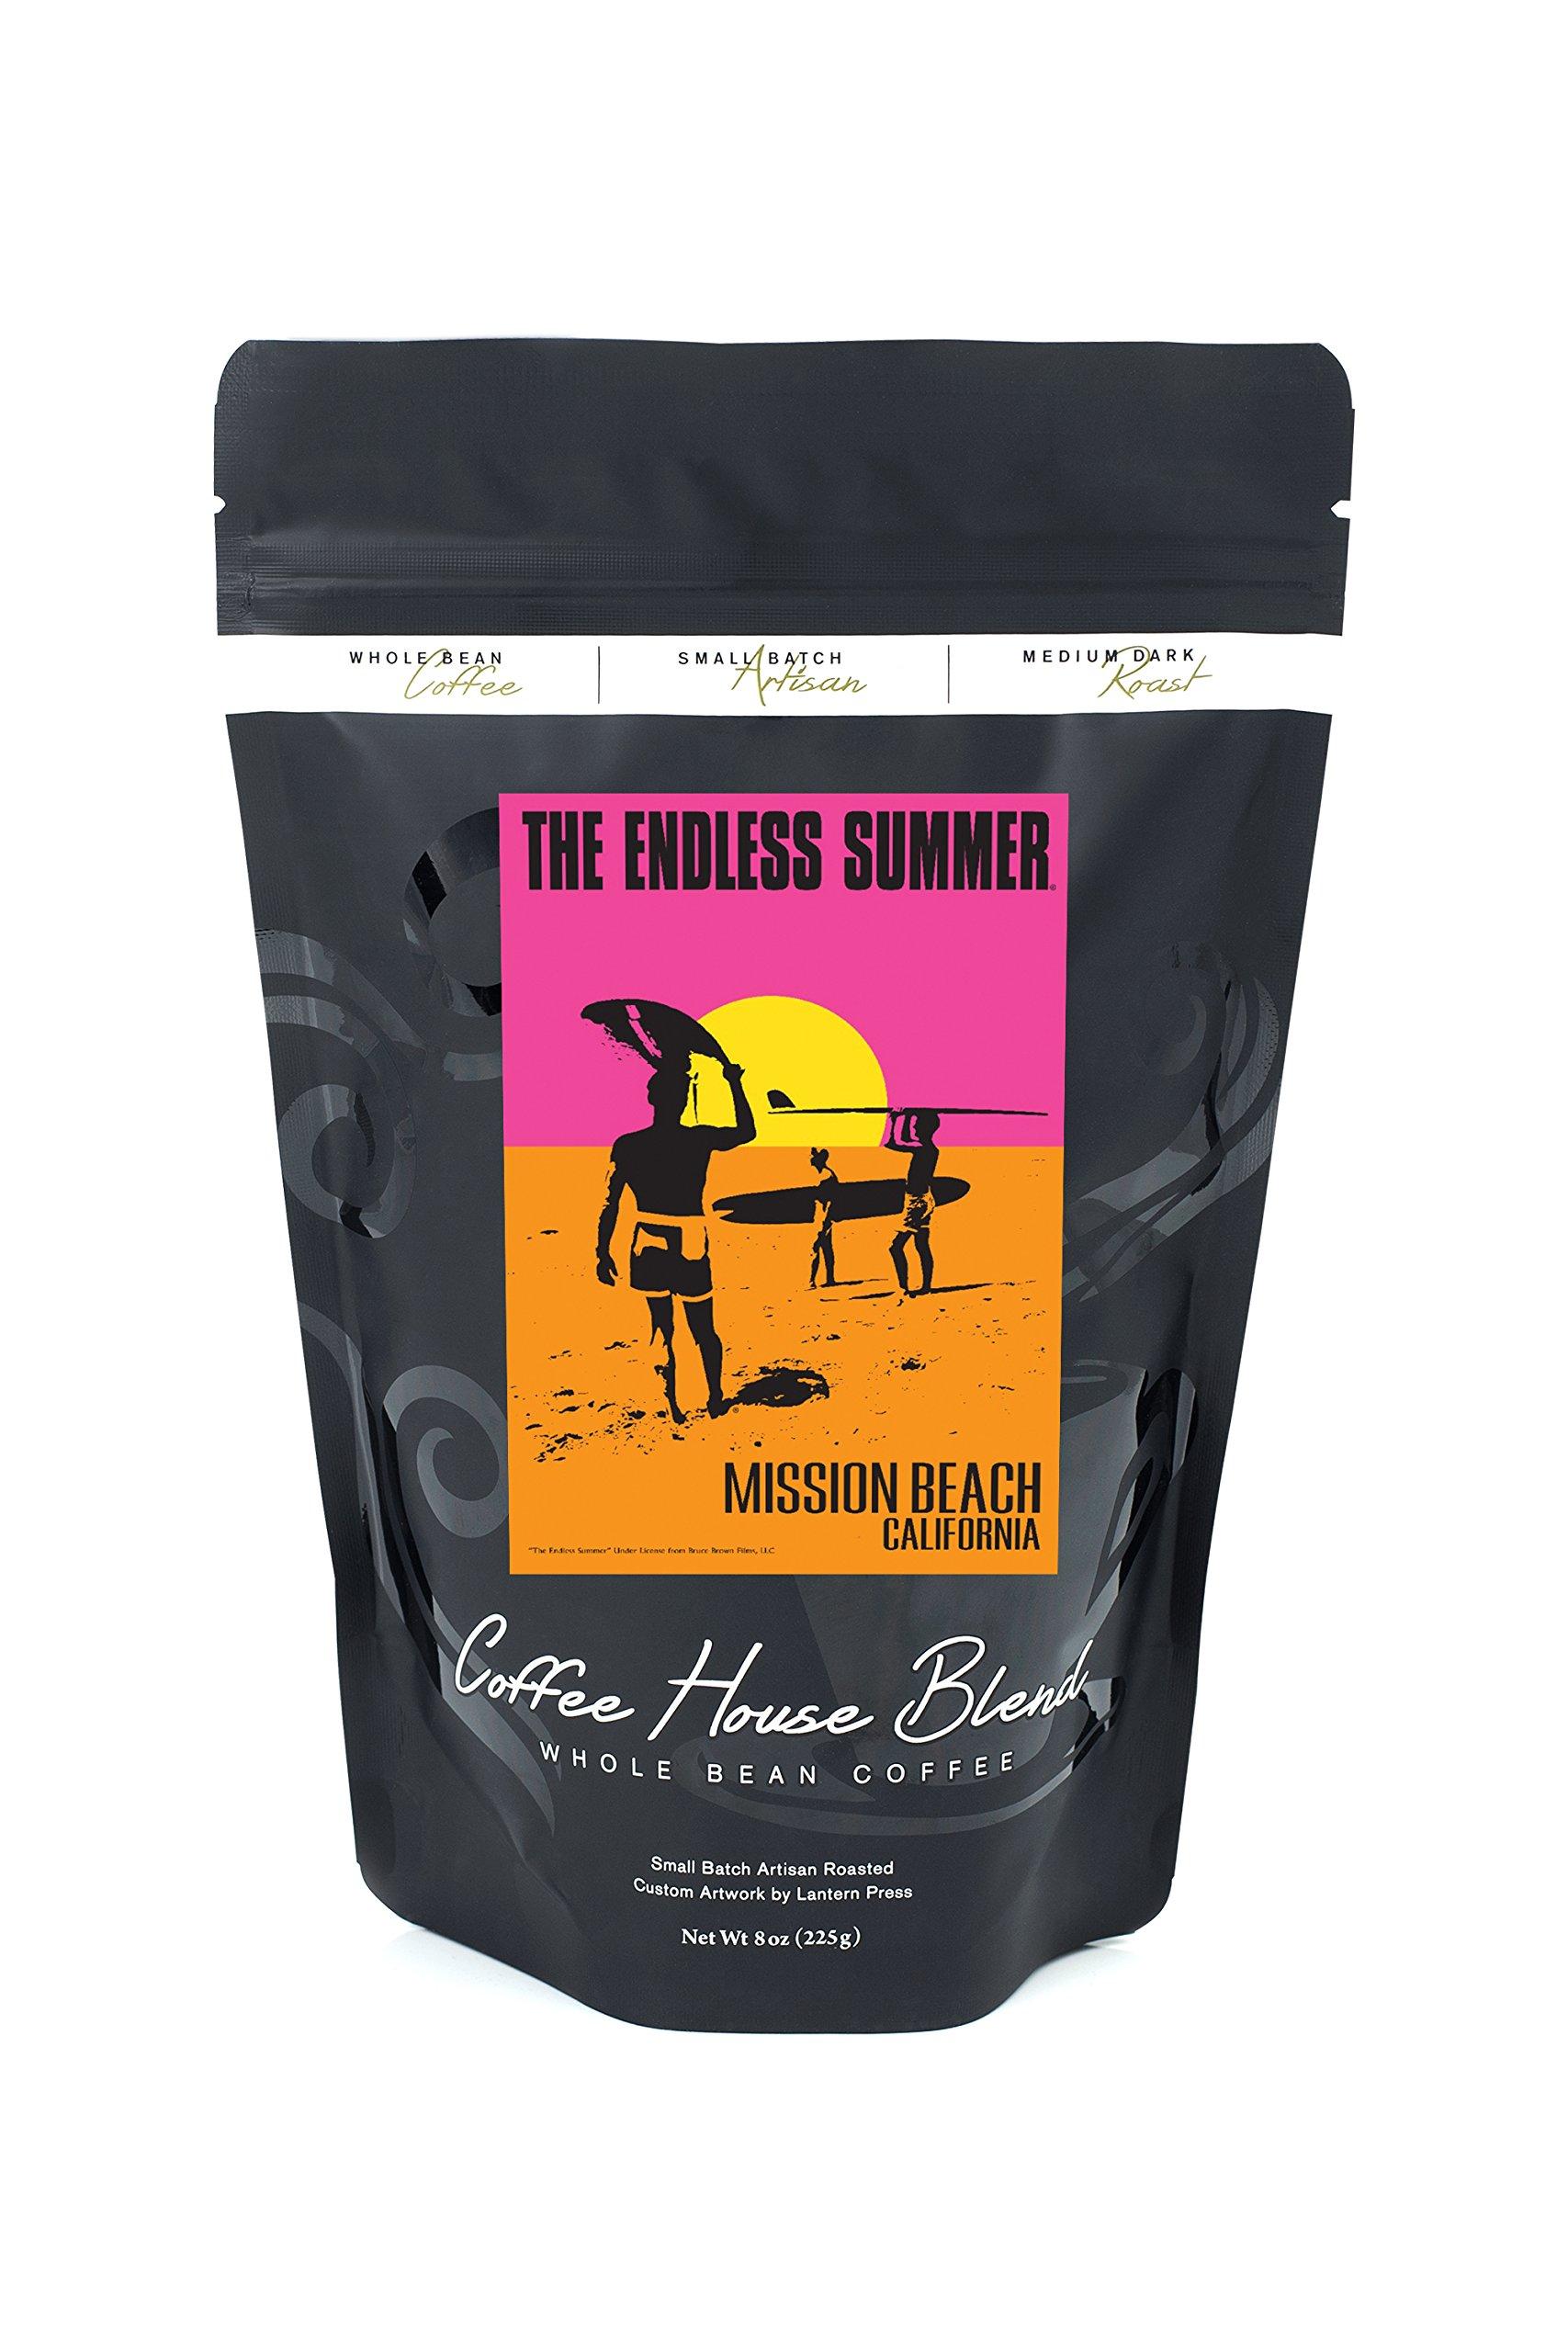 Mission Beach, California - The Endless Summer - Original Movie Poster (8oz Whole Bean Small Batch Artisan Coffee - Bold & Strong Medium Dark Roast w/ Artwork)